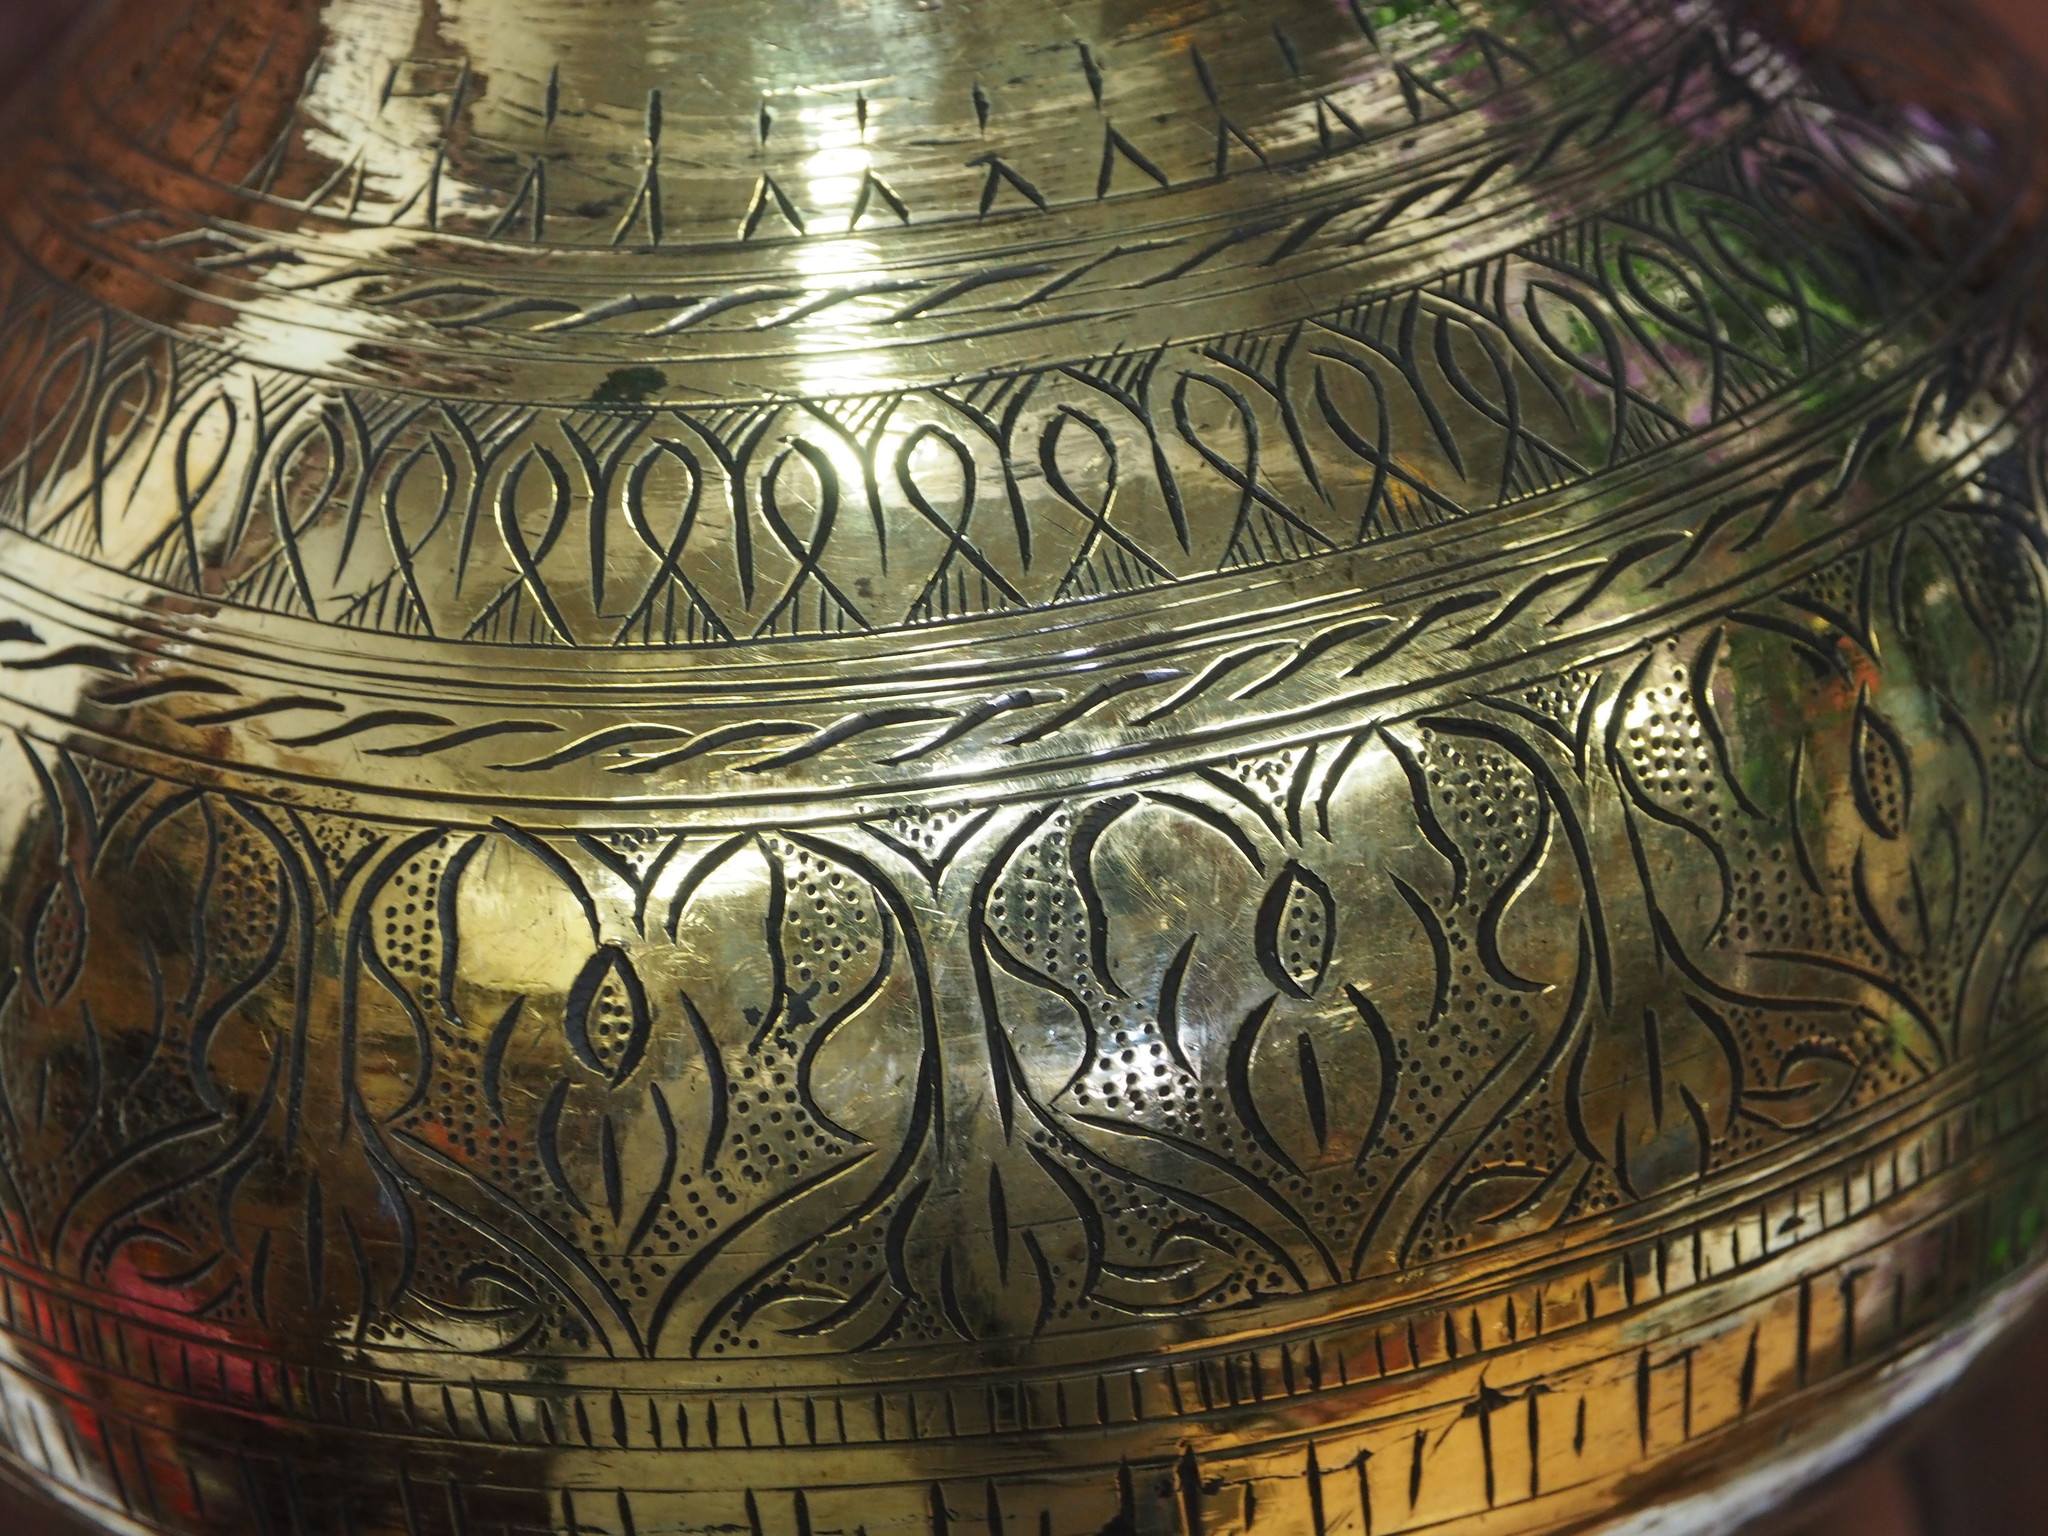 2,5 Liter antik orient Massiv Messing Ayurveda Shirodhara Stirnguss Stirnölguss öl-Therapie Panchakarma Yoga Dhara Vessel gefäß -Nr: 21/ 12